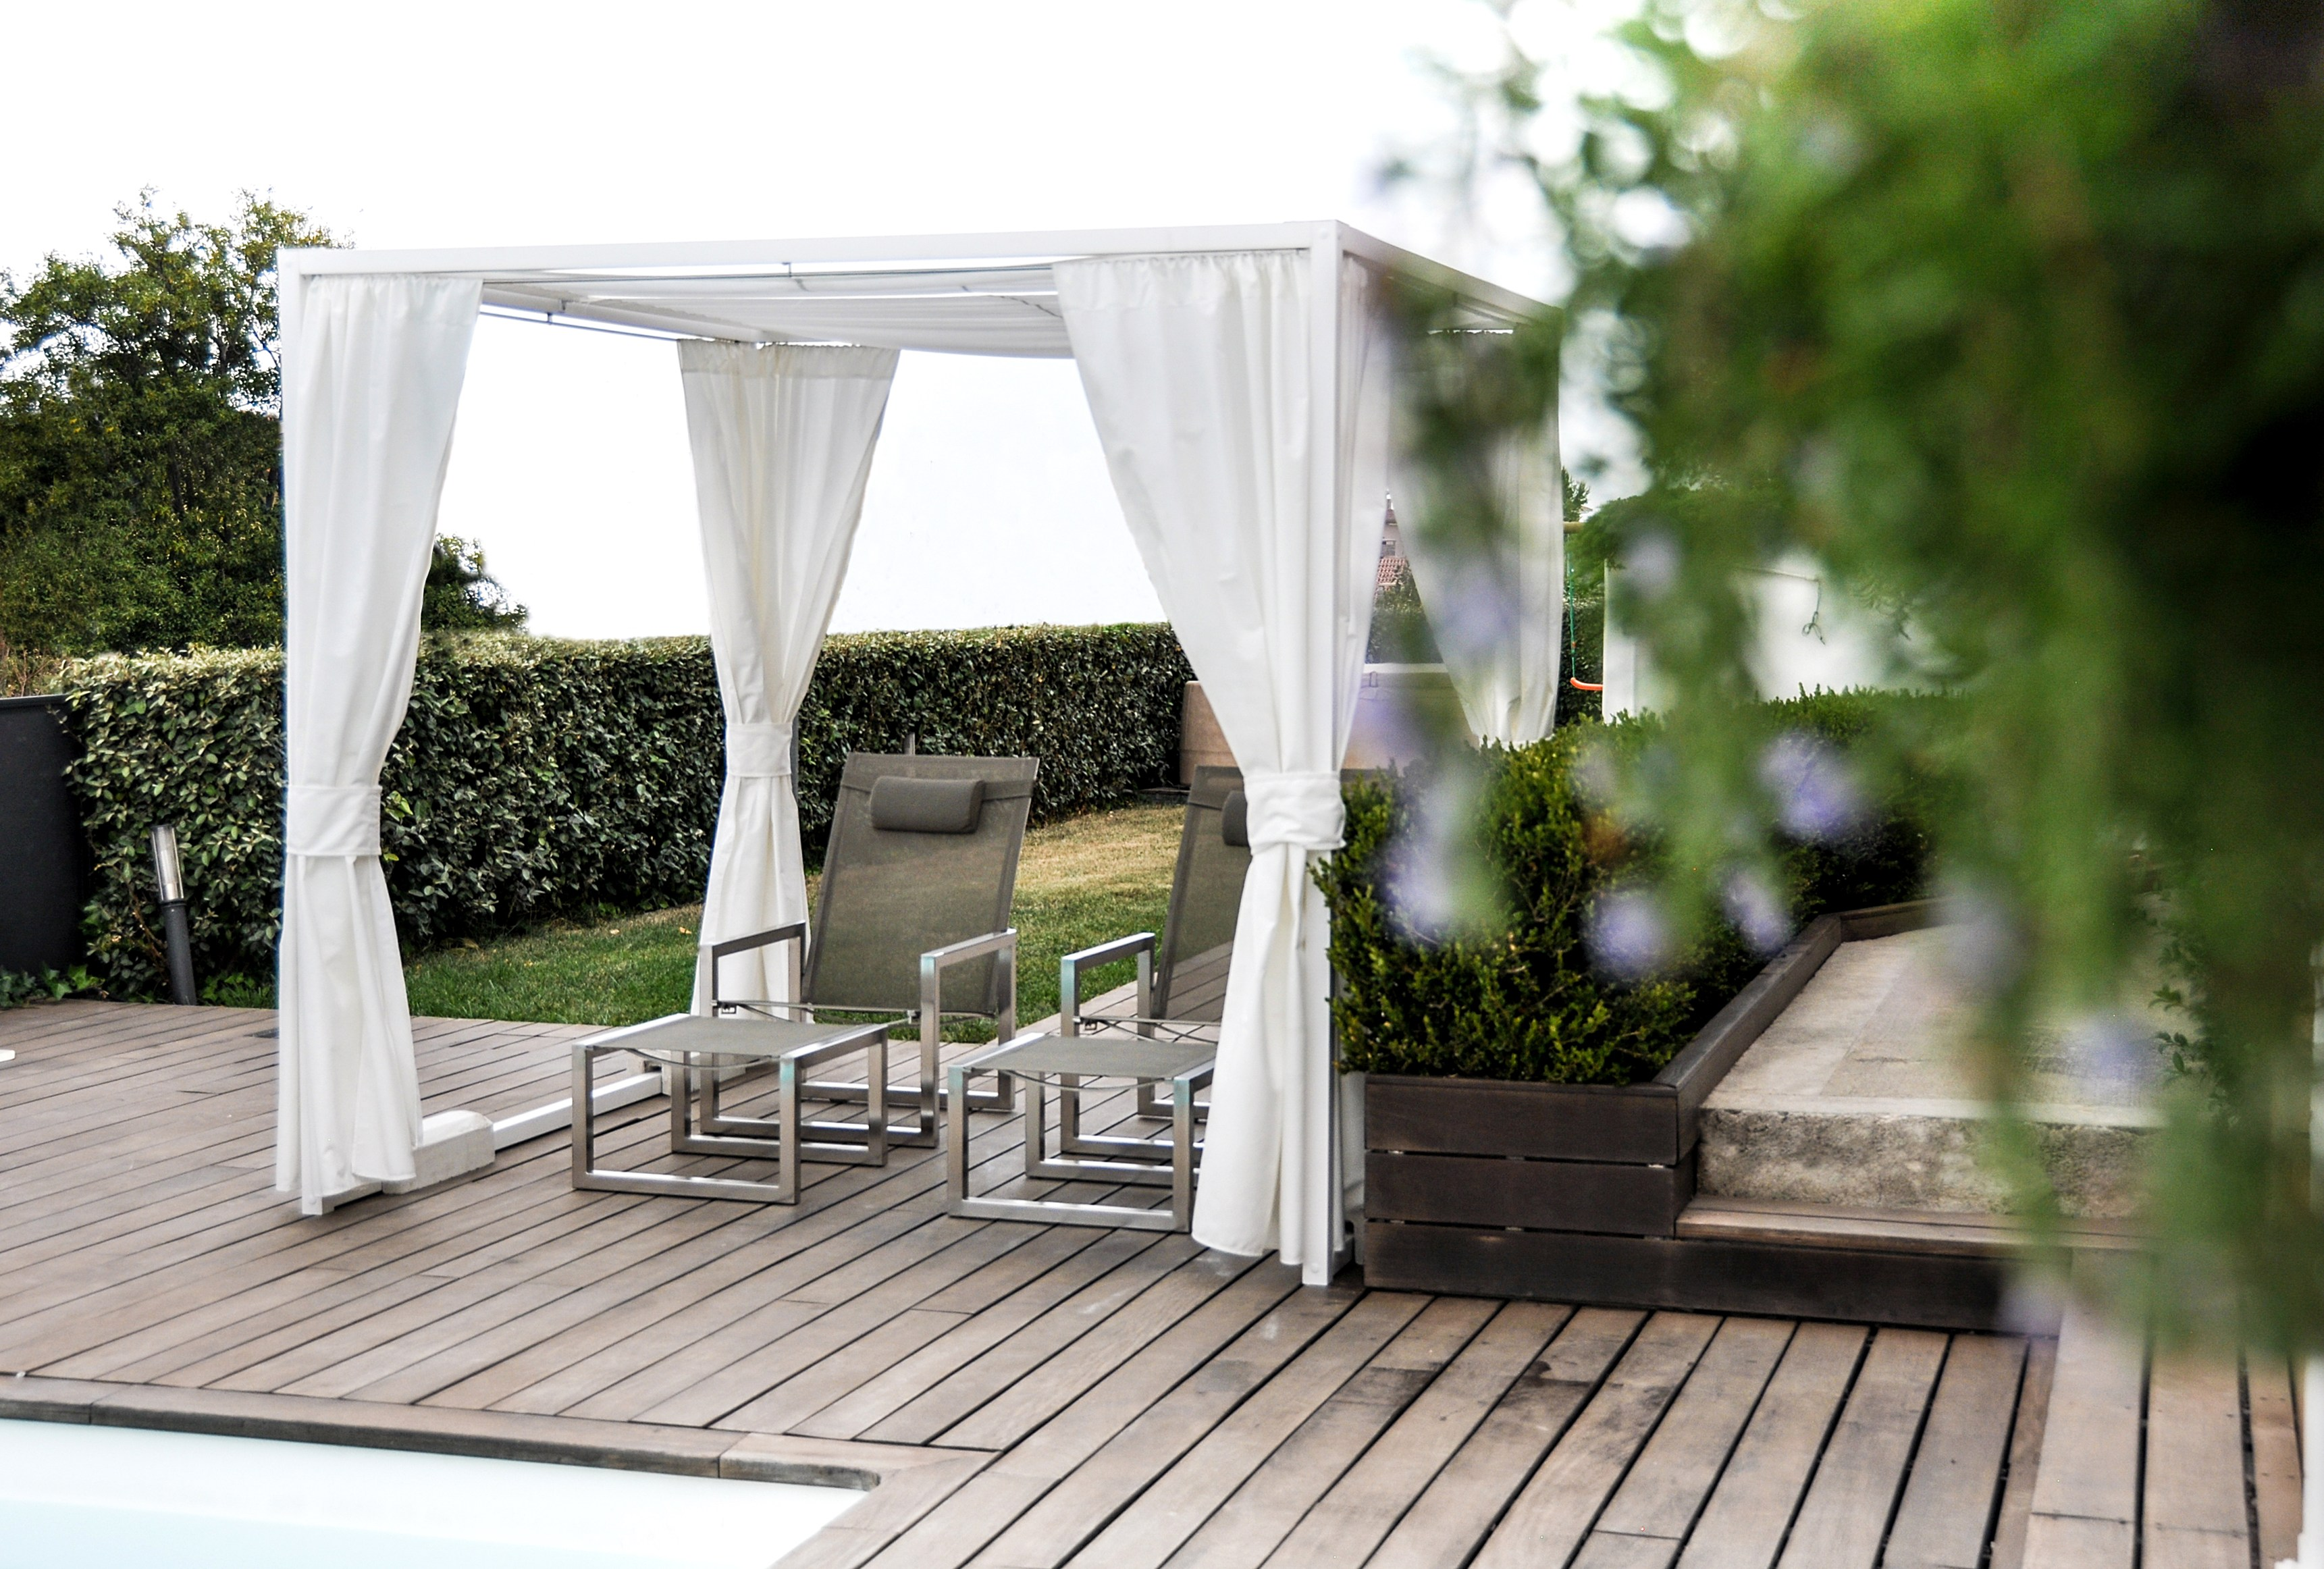 Gartenpavillon Aus Aluminium Duo By Unosider Gartenpavillon Aus Aluminium